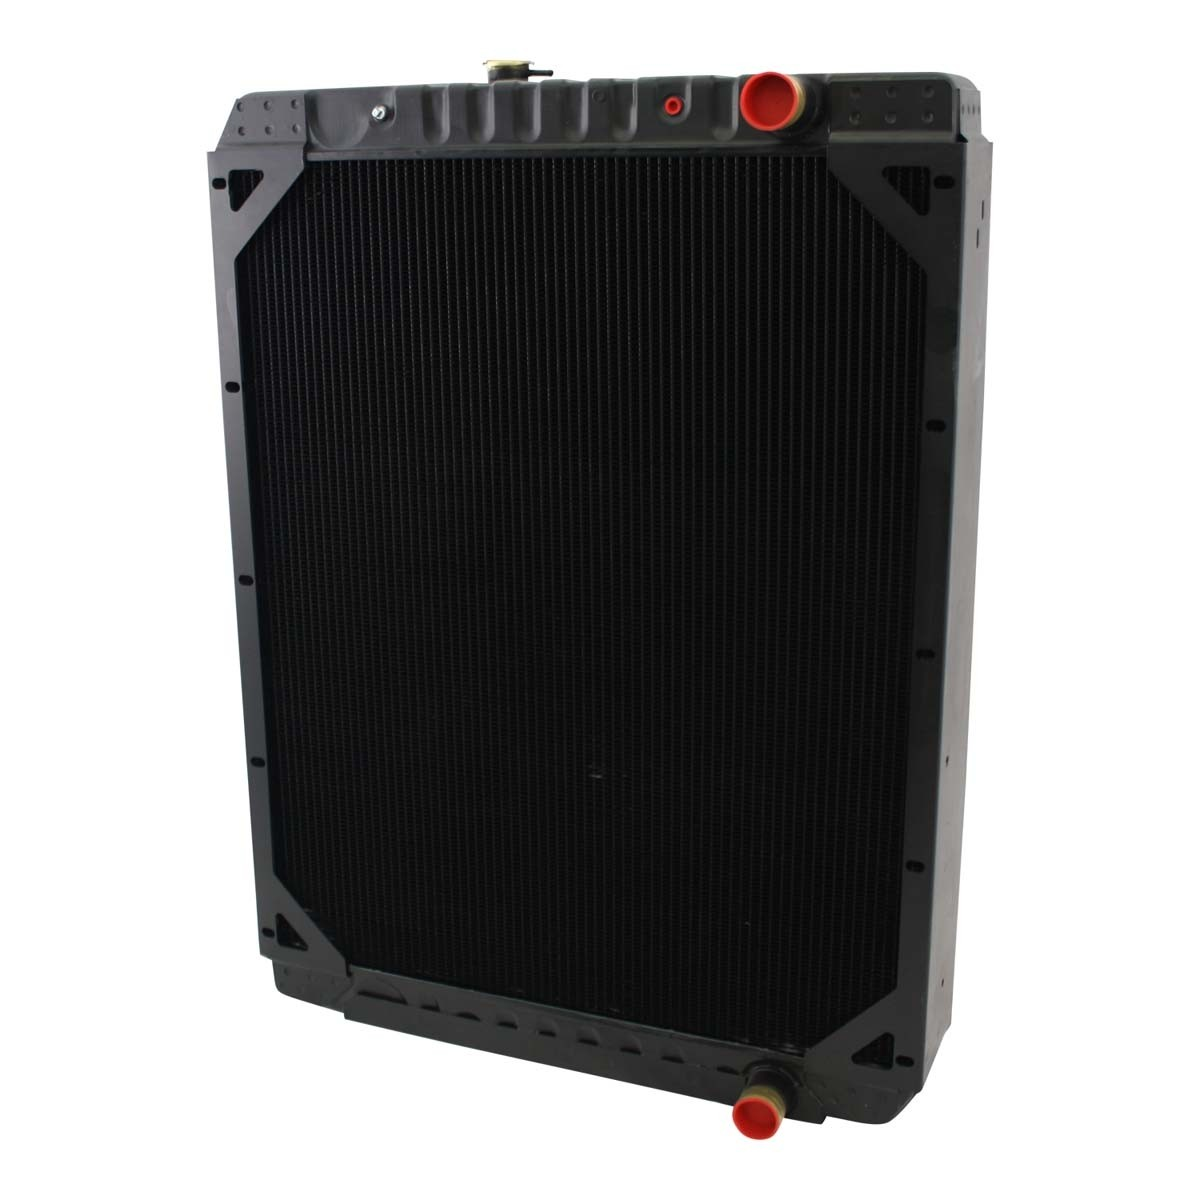 Case International Harvester Combine Radiator.